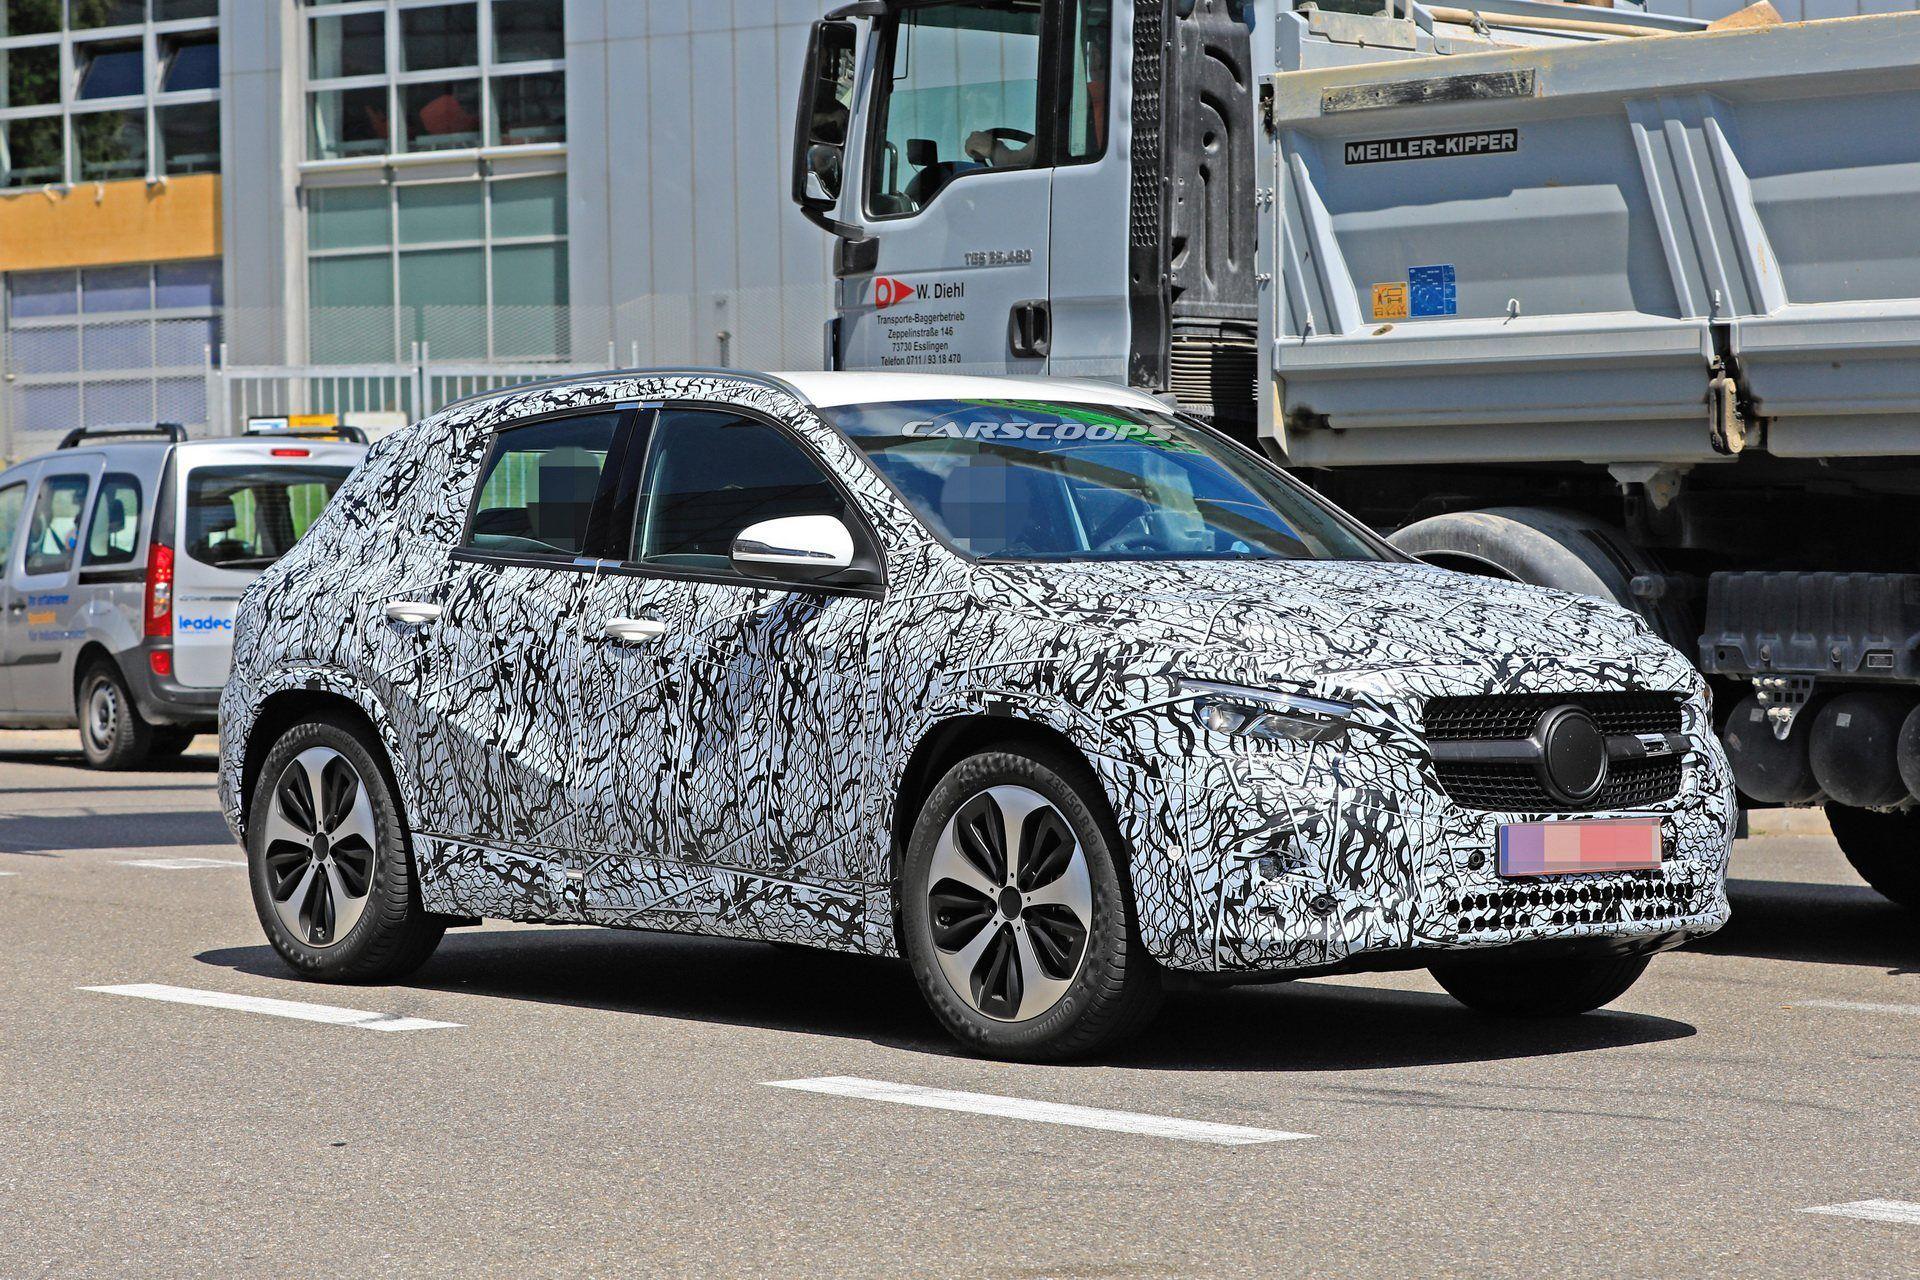 2020 Jaguar Suv Price Design And Review In 2020 Jaguar Suv Suv Prices Volkswagen